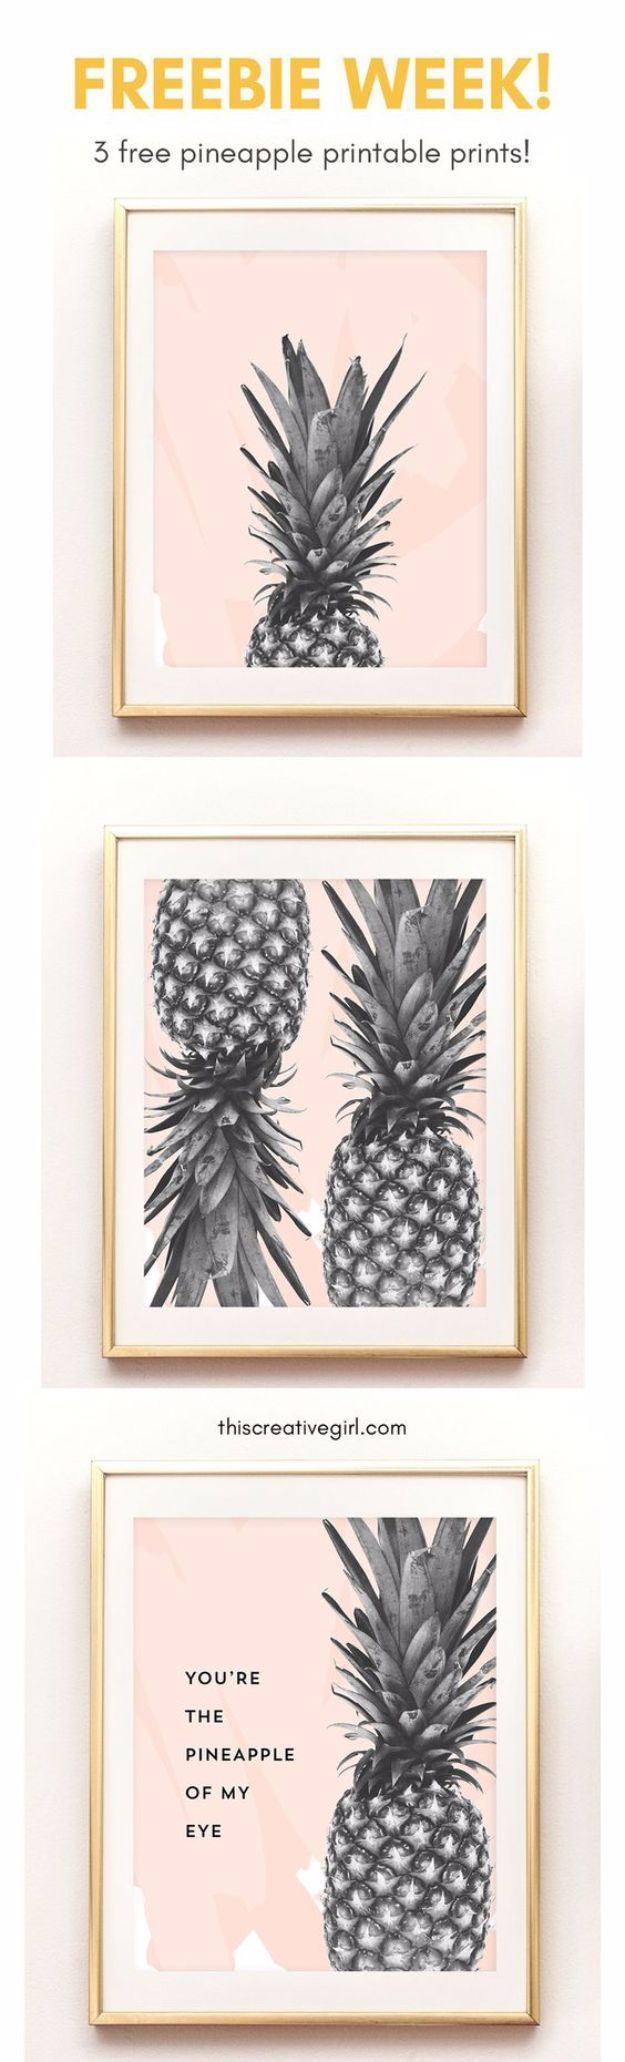 best 25 pineapple pictures ideas on pinterest summer photos